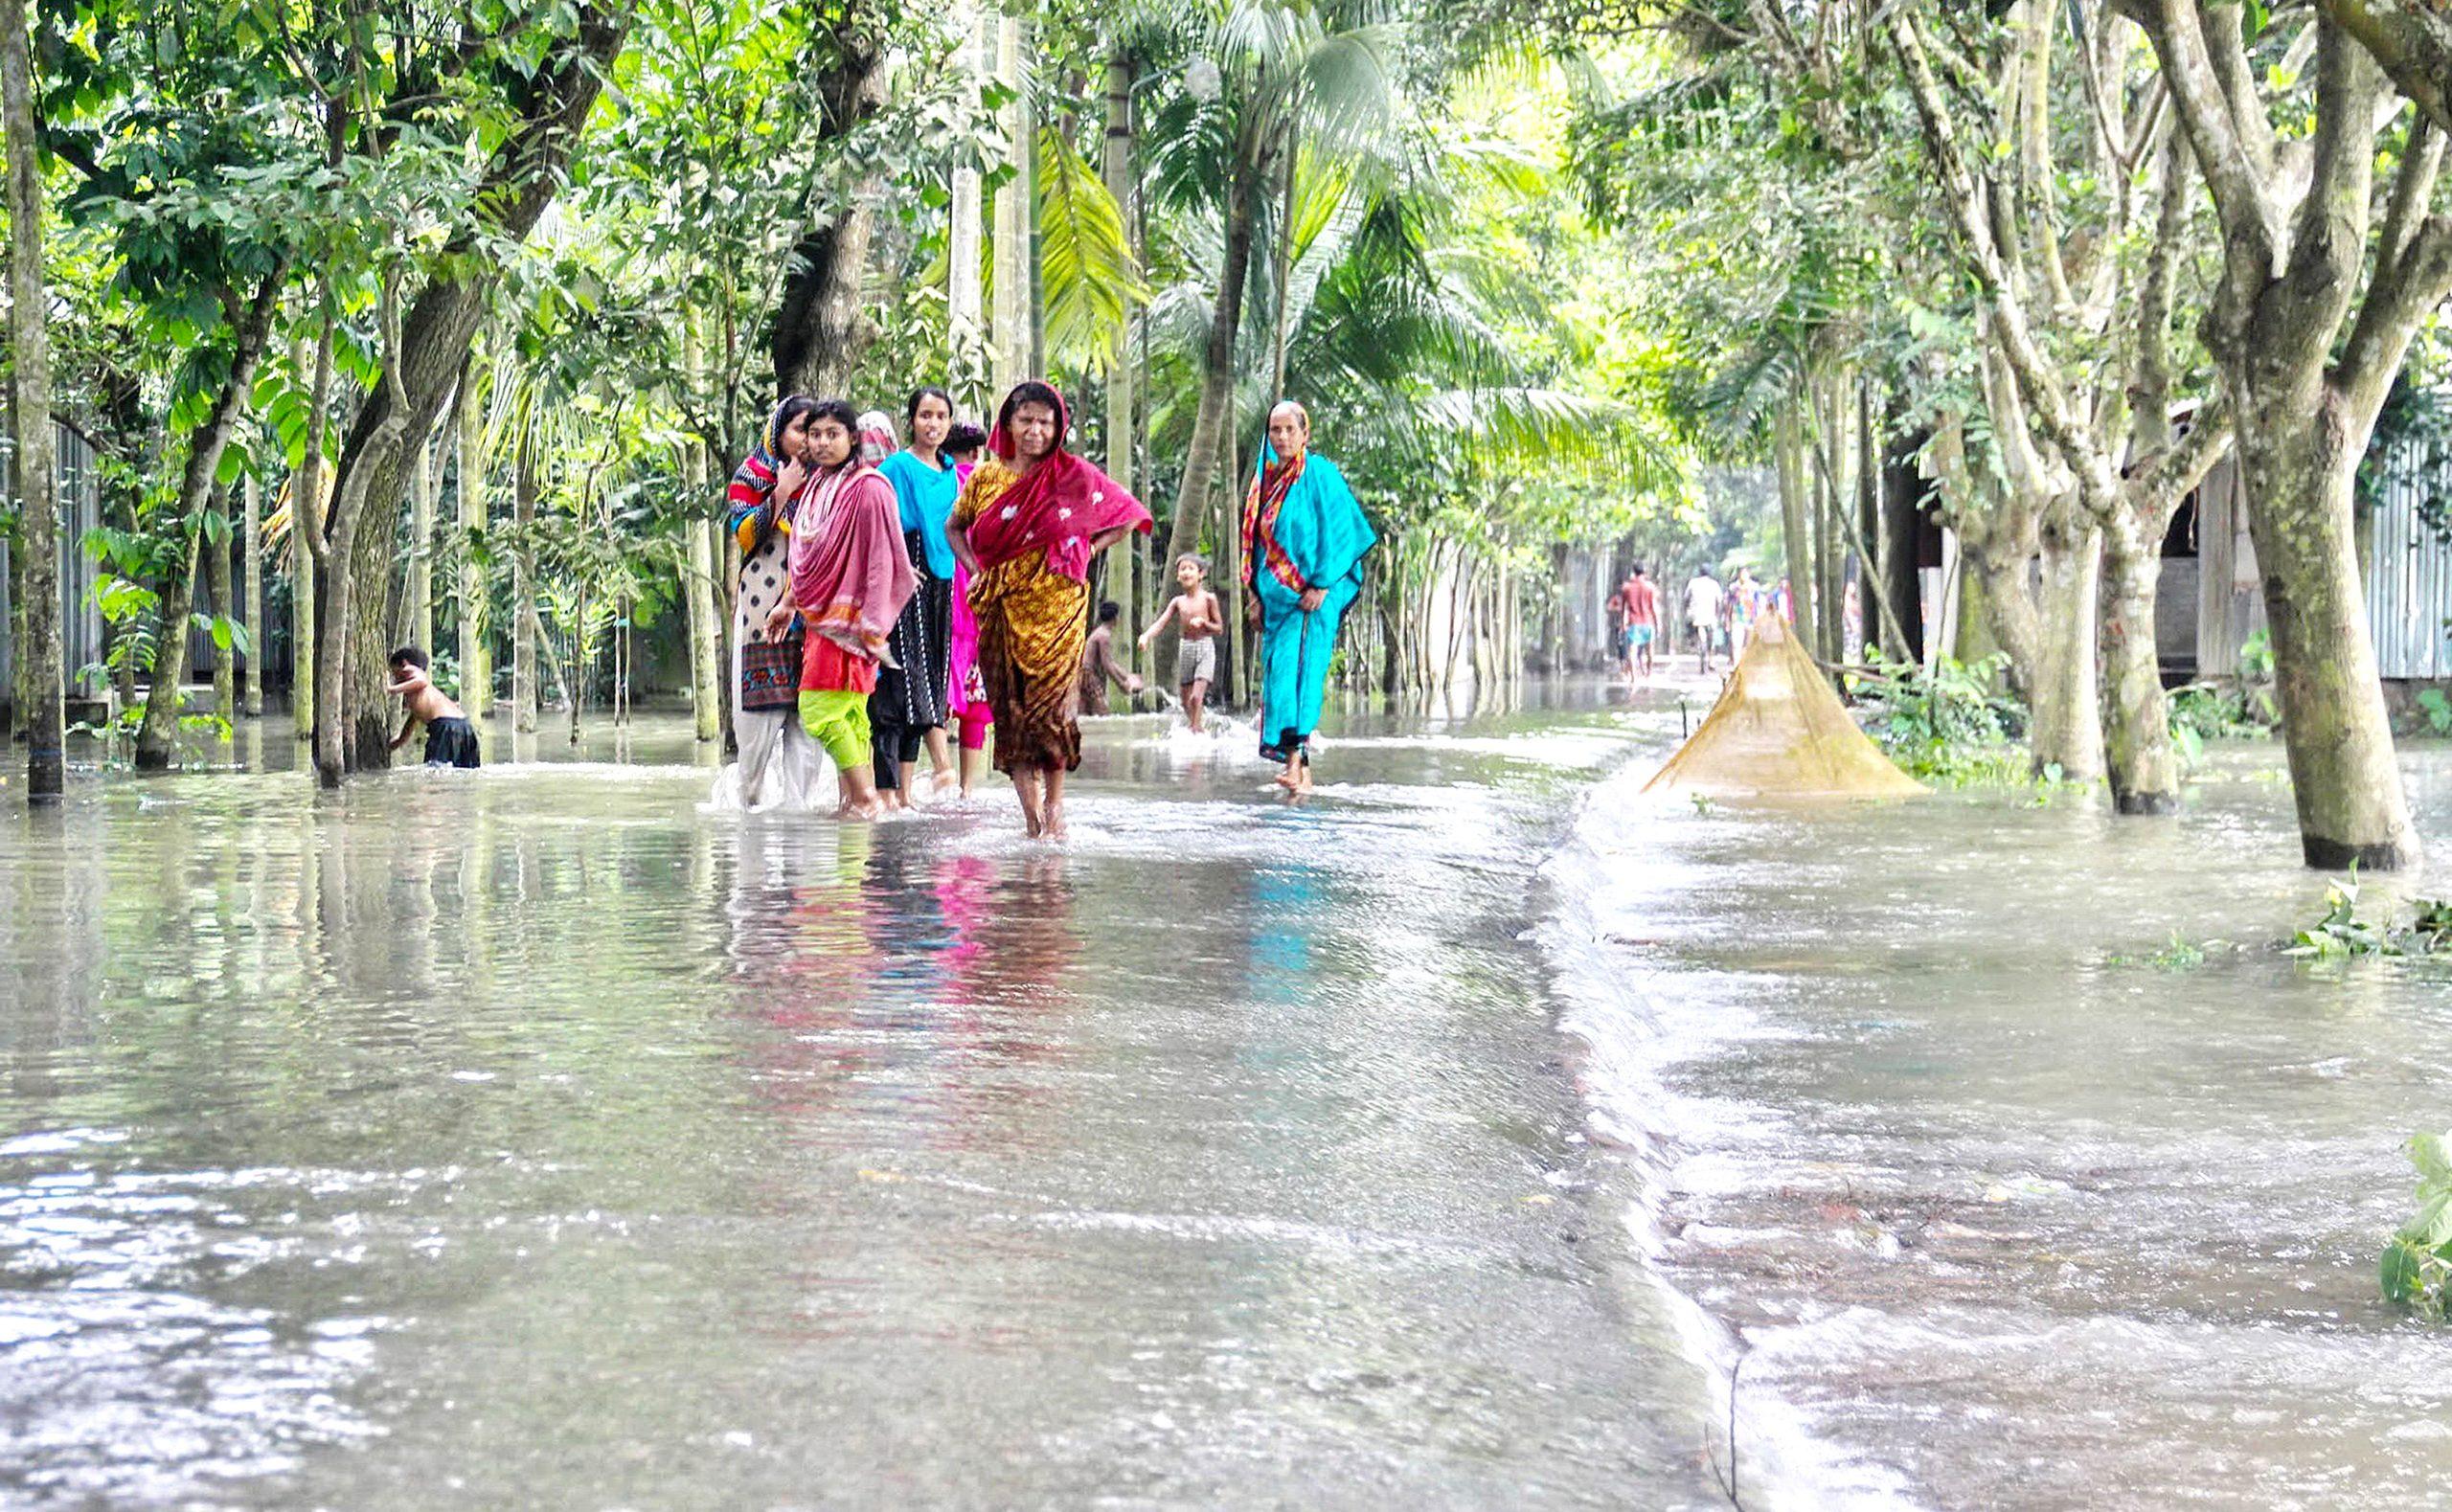 Flooding in Sirajganj, Bangladesh